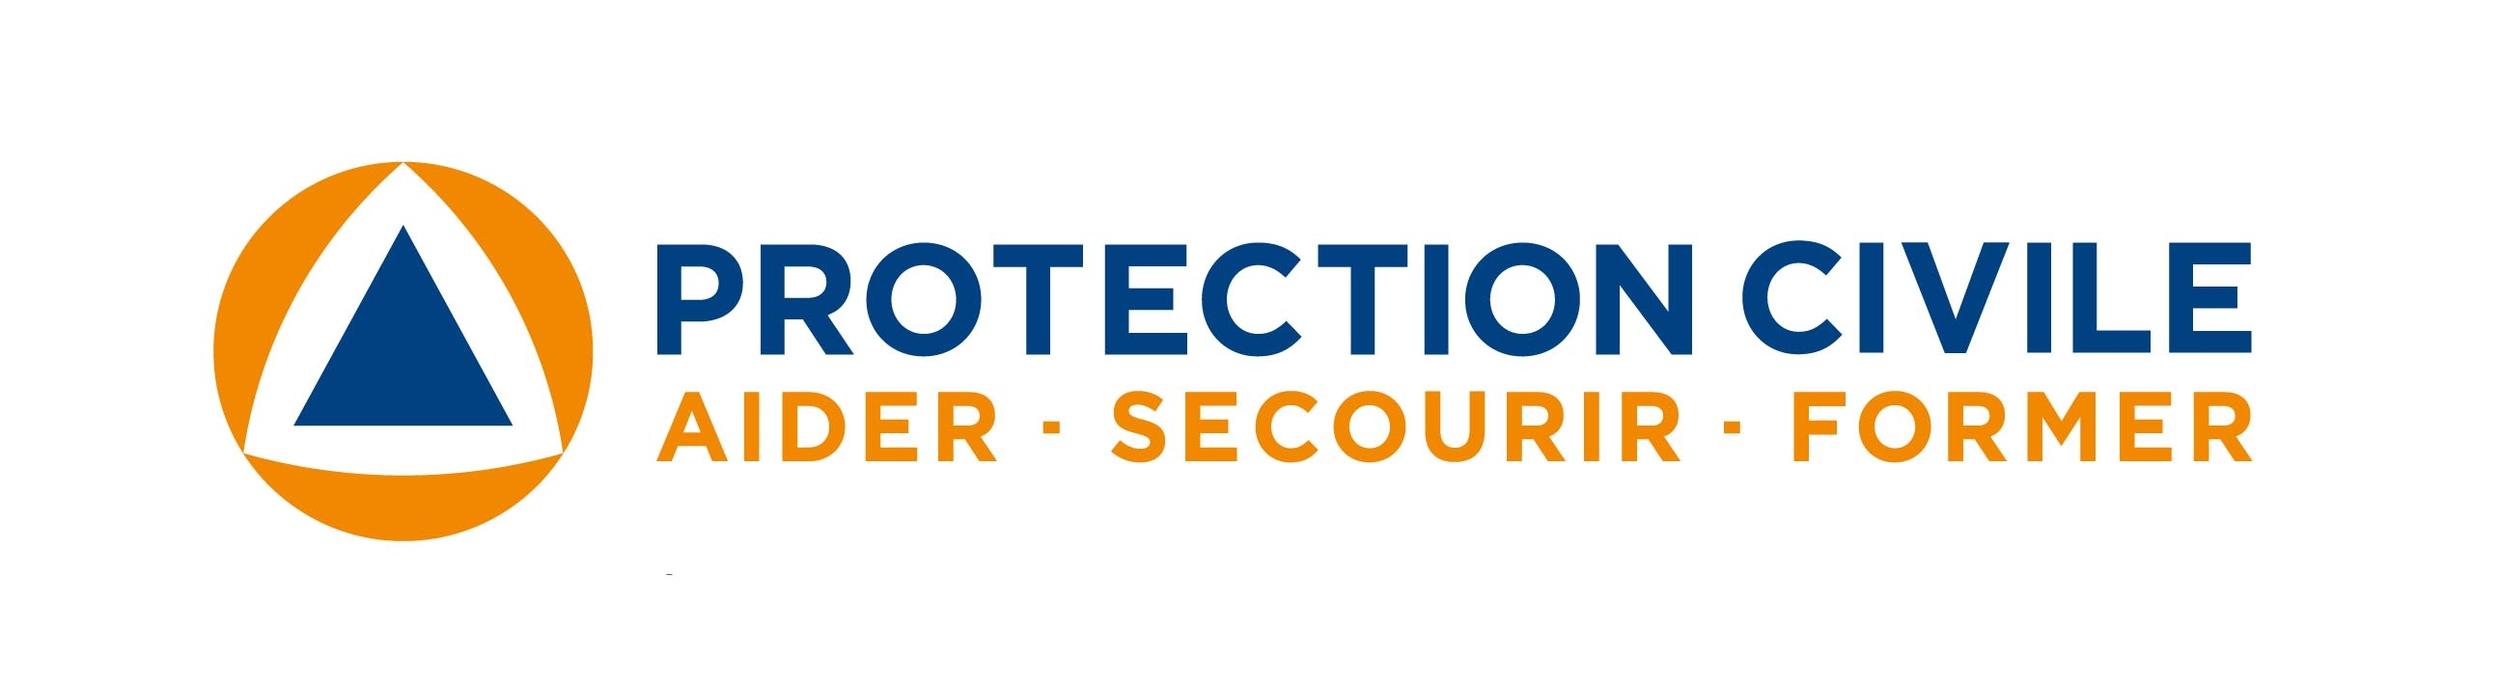 logo-protection-civile-01